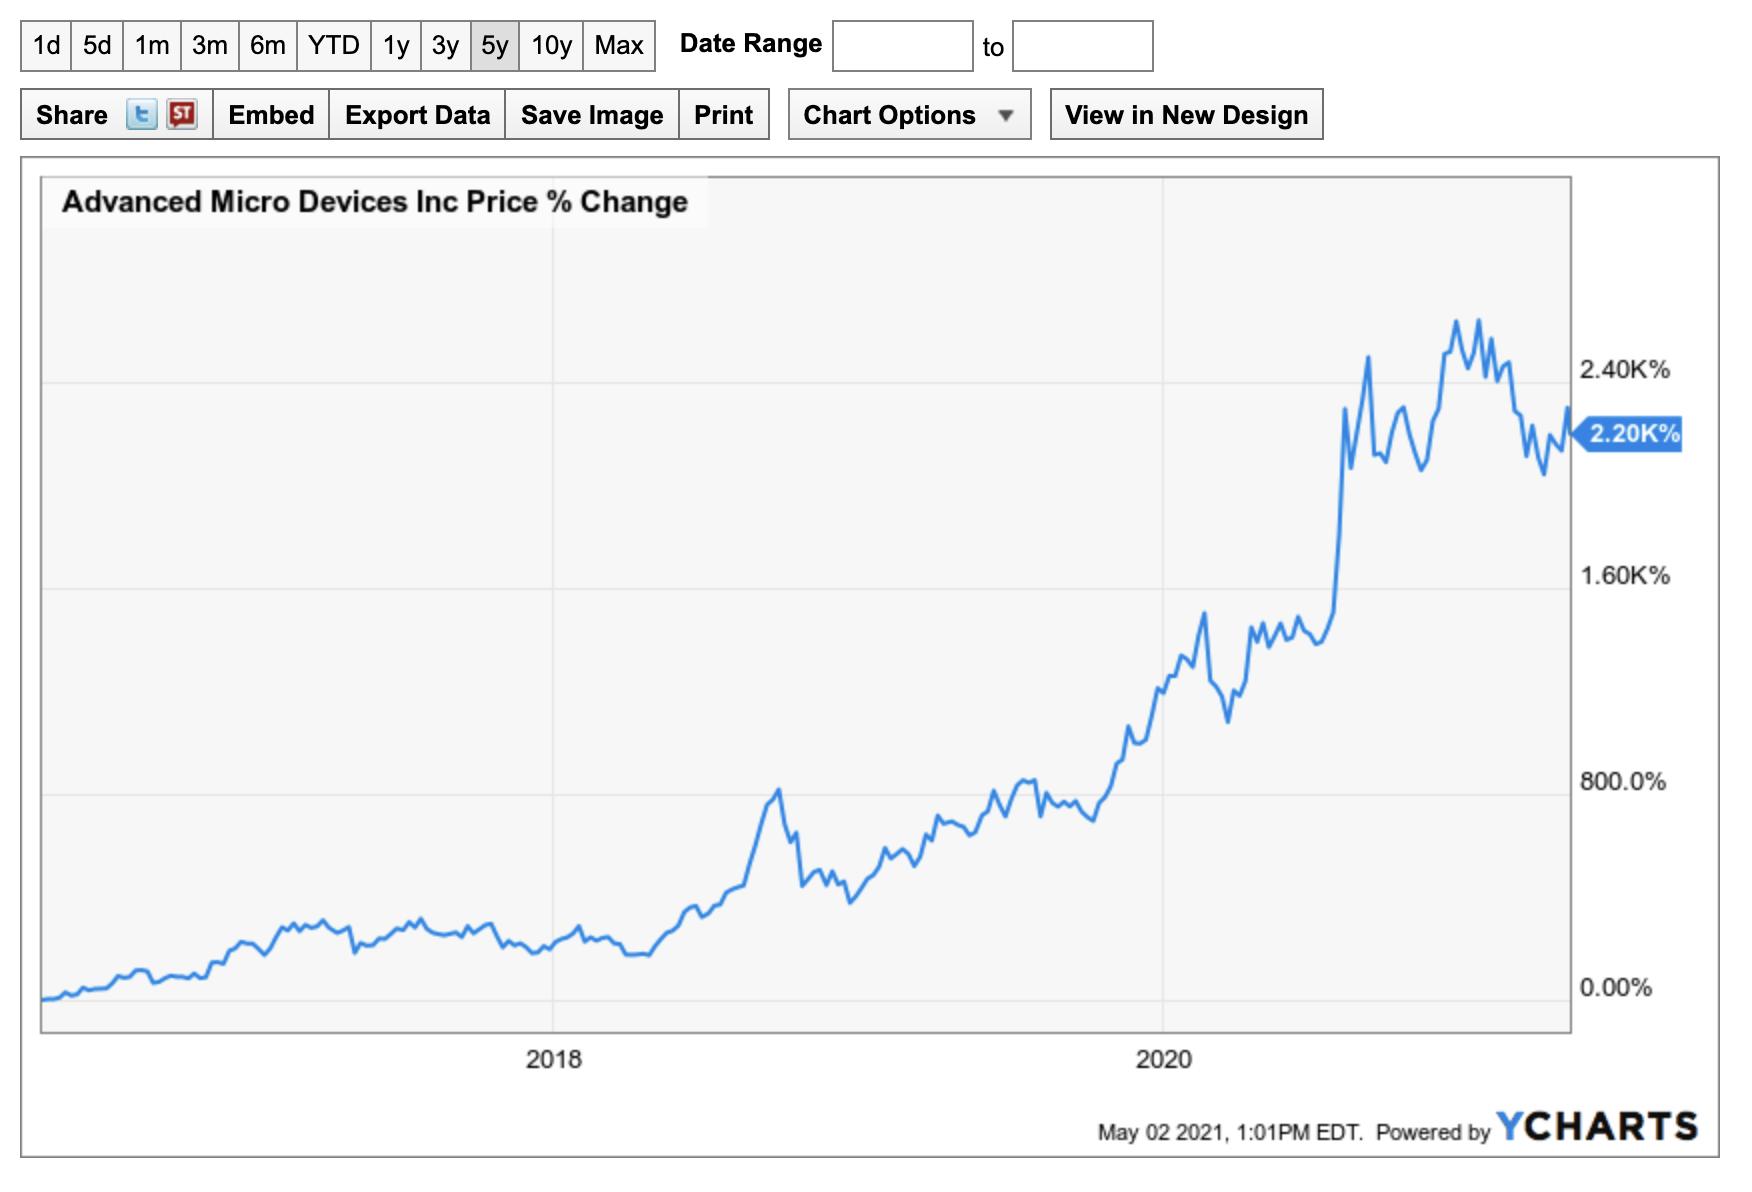 AMD stock price growth 5 years chart